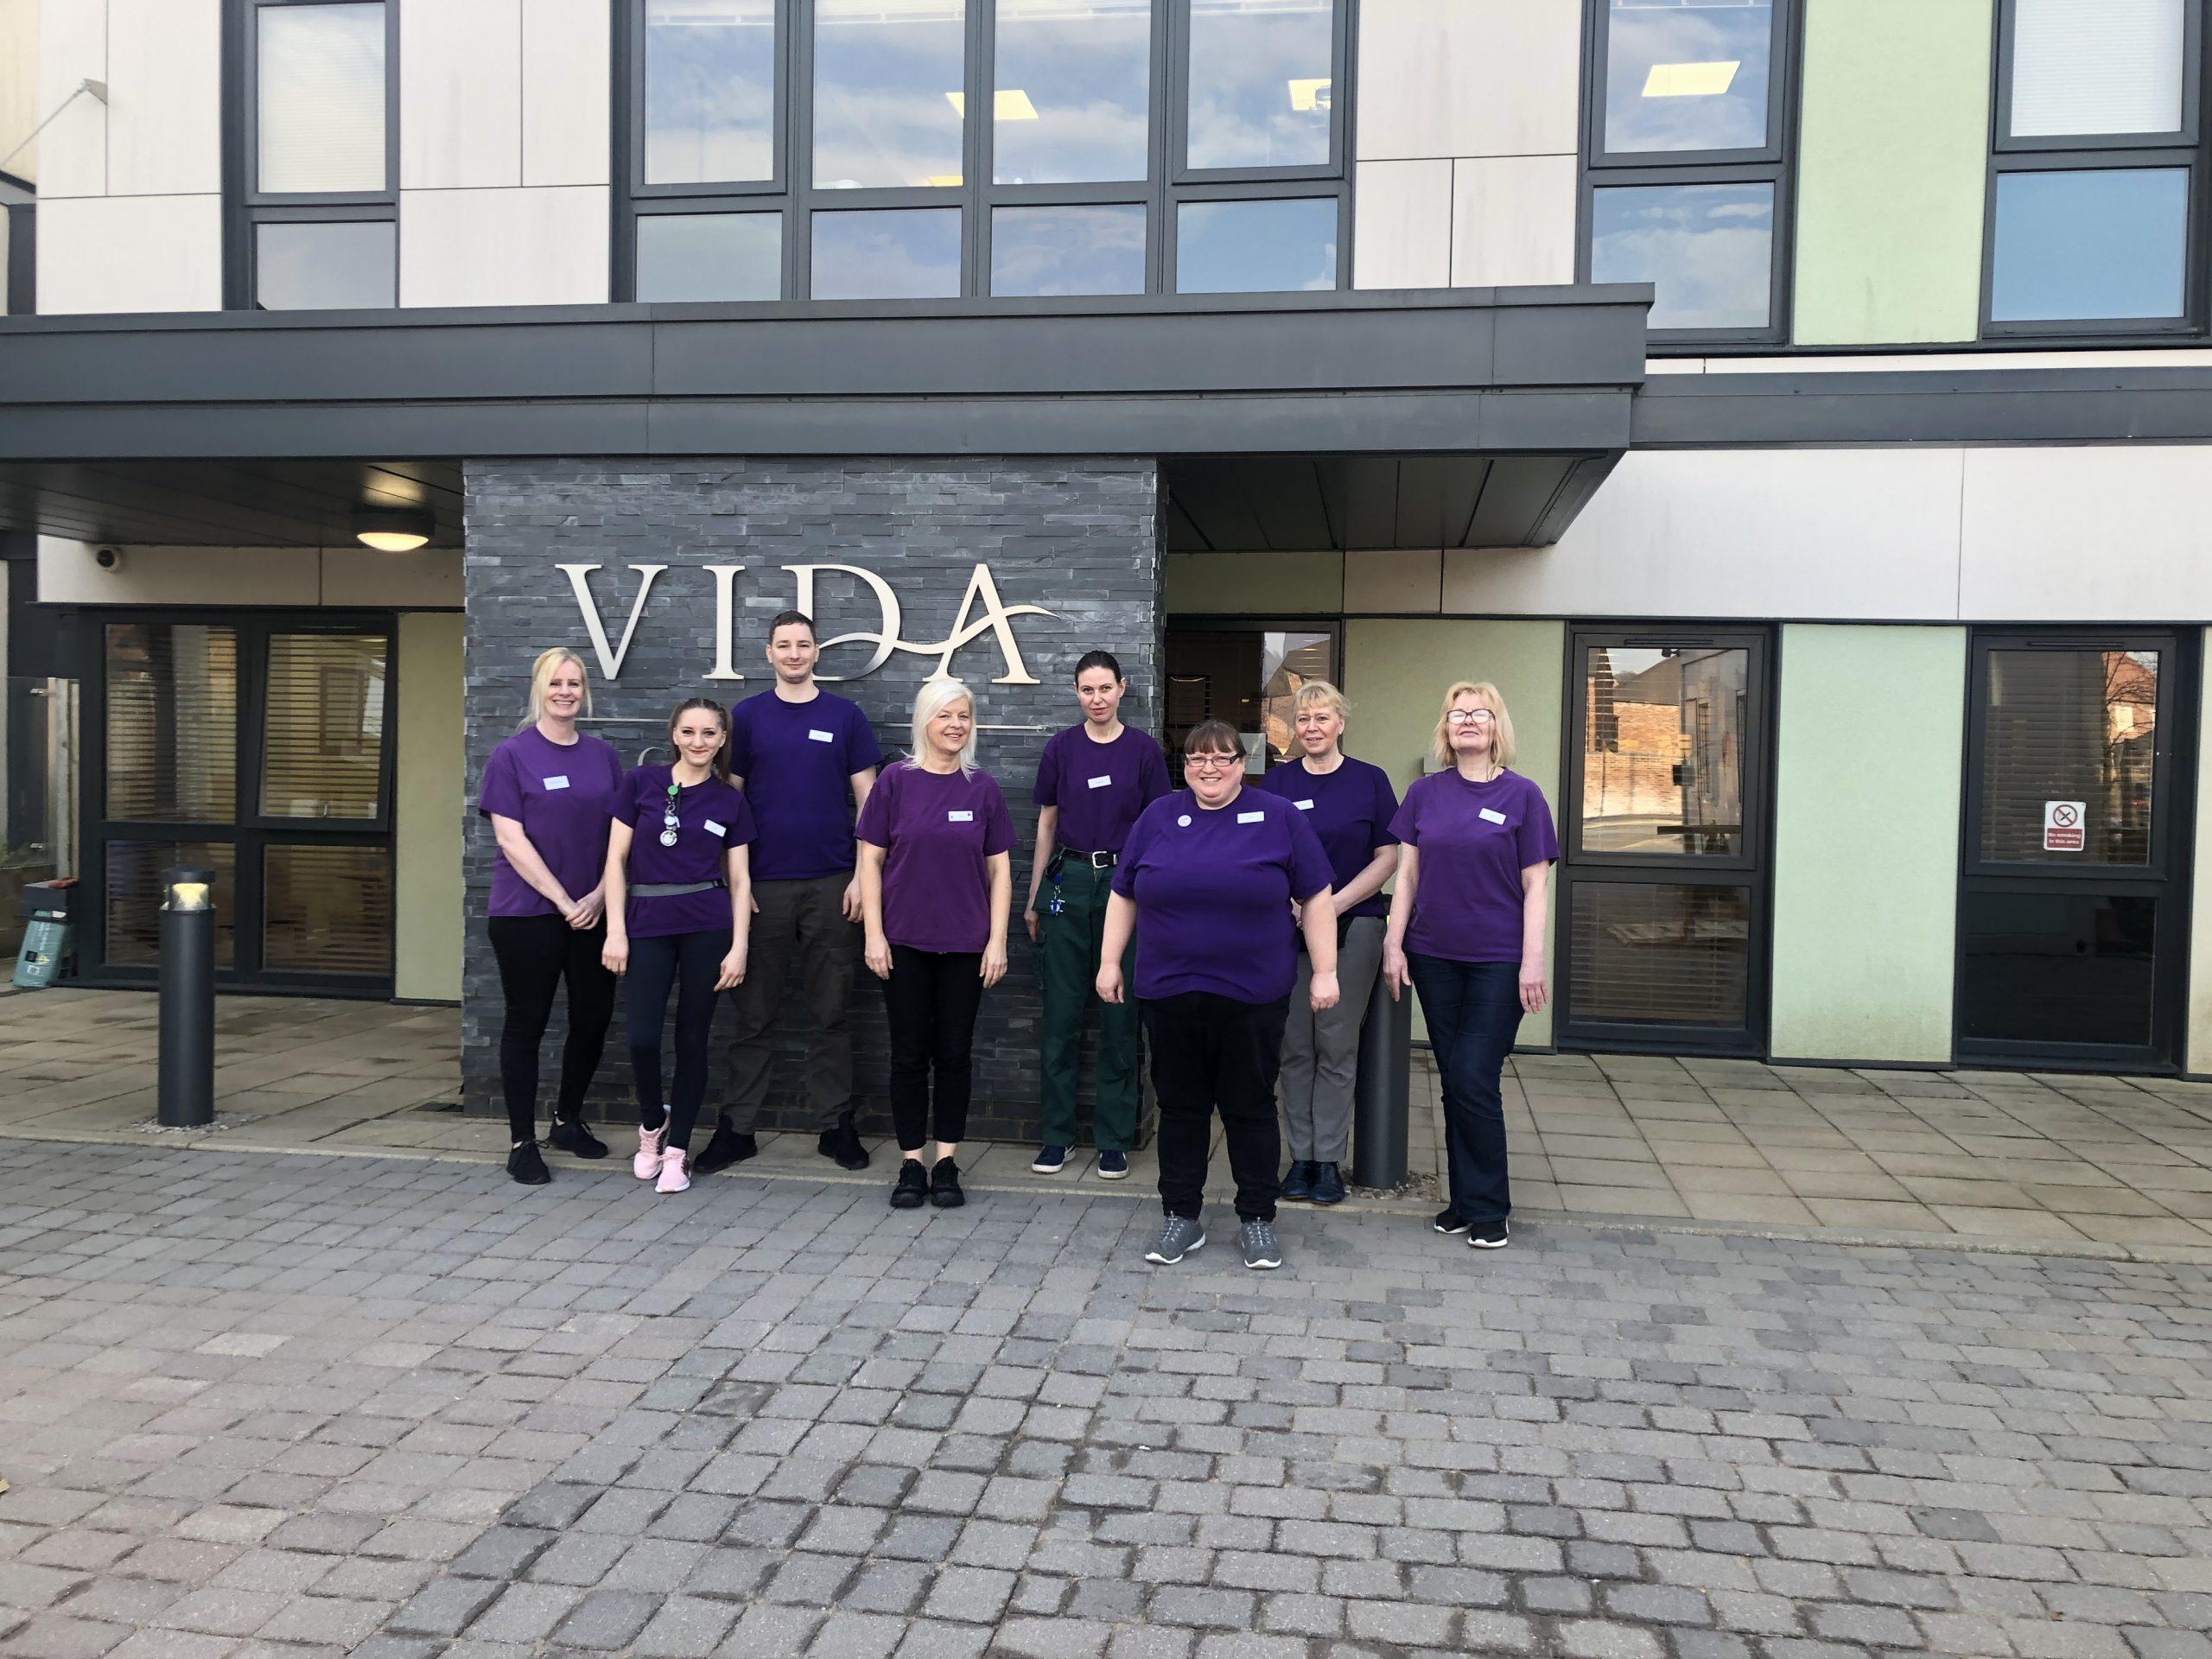 Vida Grange Housekeeping